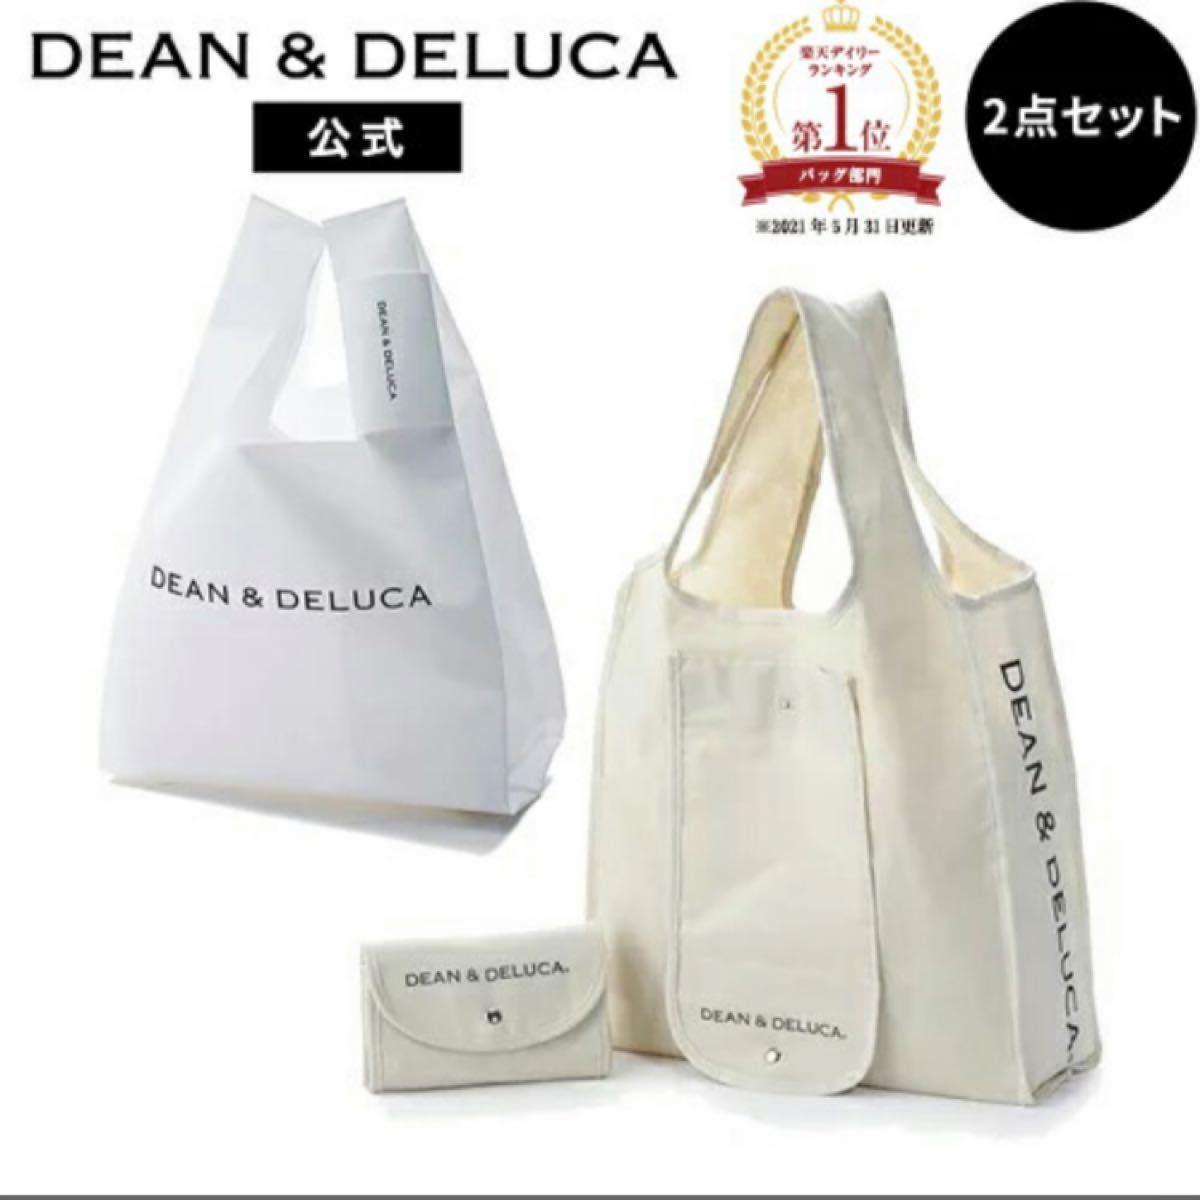 DEAN&DELUCA エコバッグ ディーンアンドデルーカ ディーン&デルーカ トートバッグ 新品